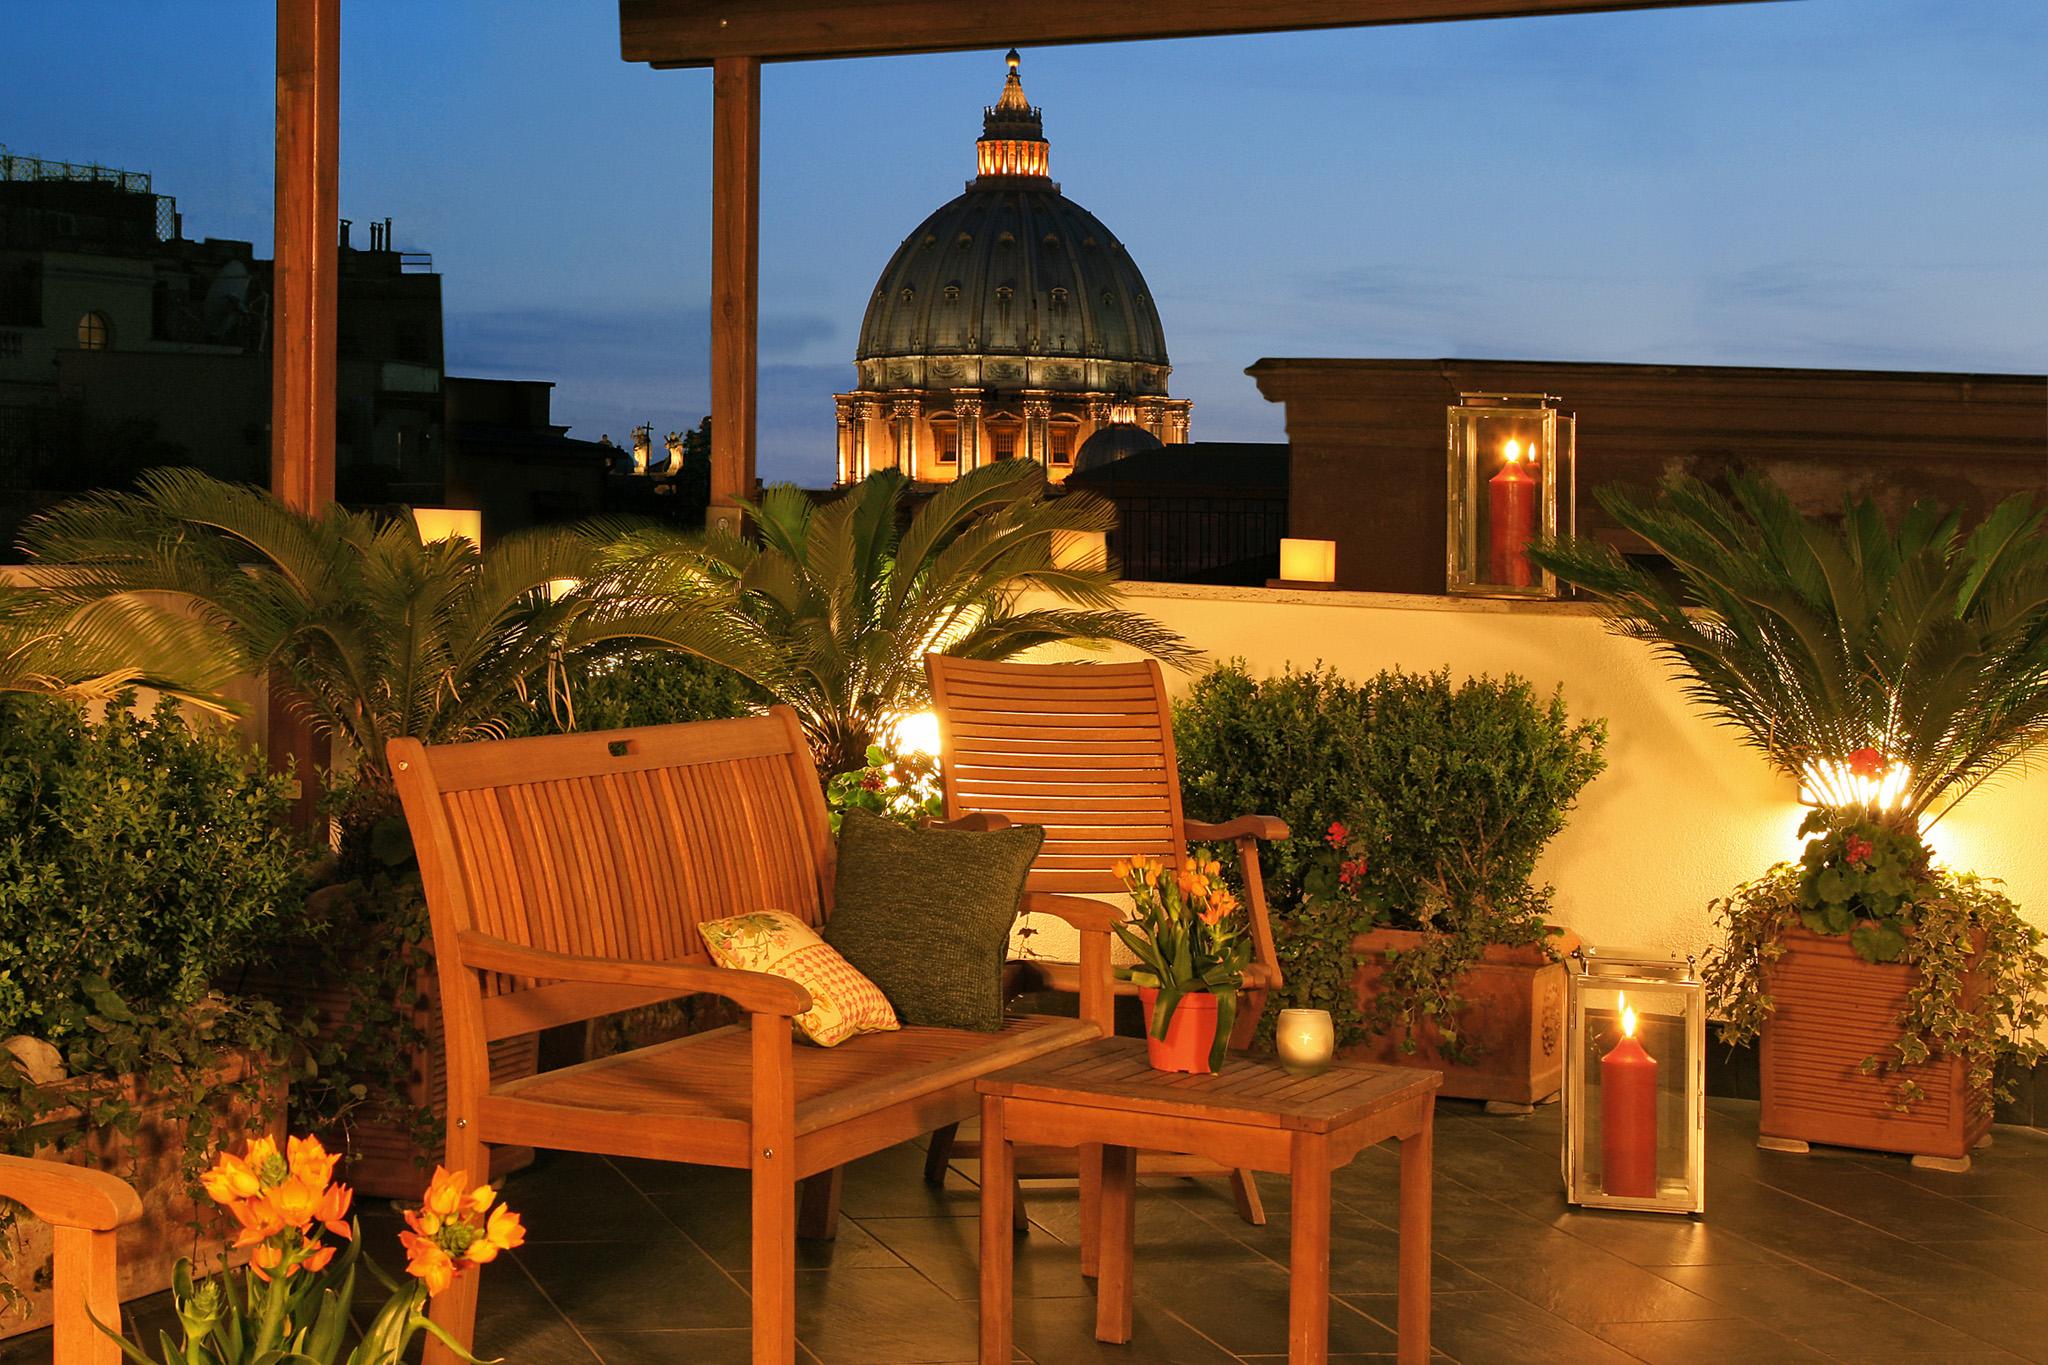 Hotel Arcangelo Via Boezio Roma